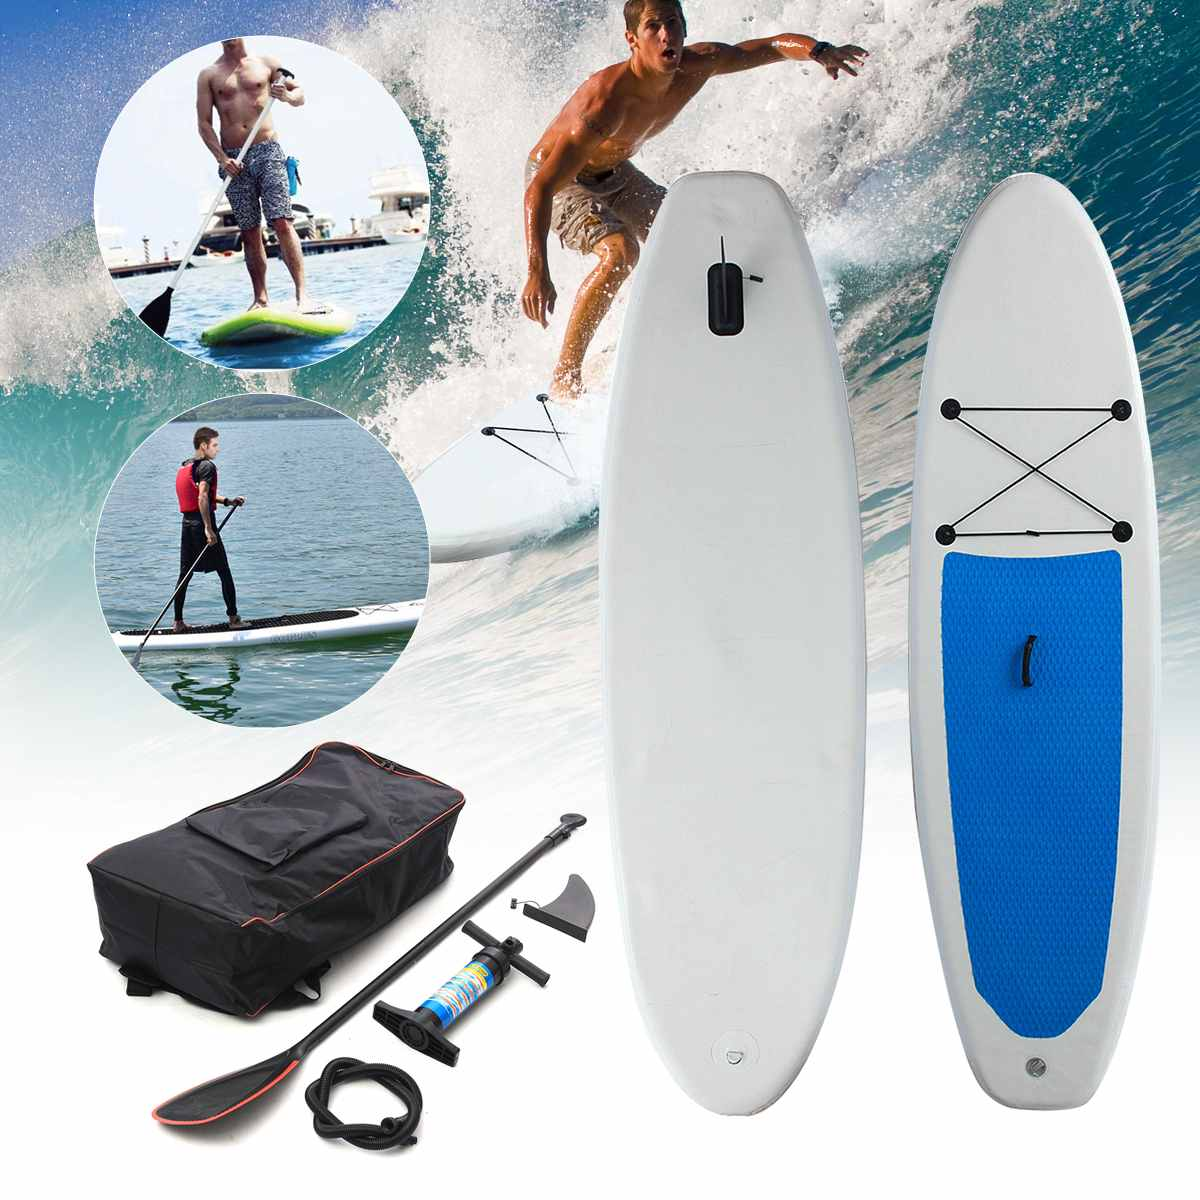 acd9254e7 Gofun 310 68.5 10 cm Prancha de Stand Up Paddle Board SUP Inflável Set W  ave Piloto + Bomba prancha inflável barco de remo